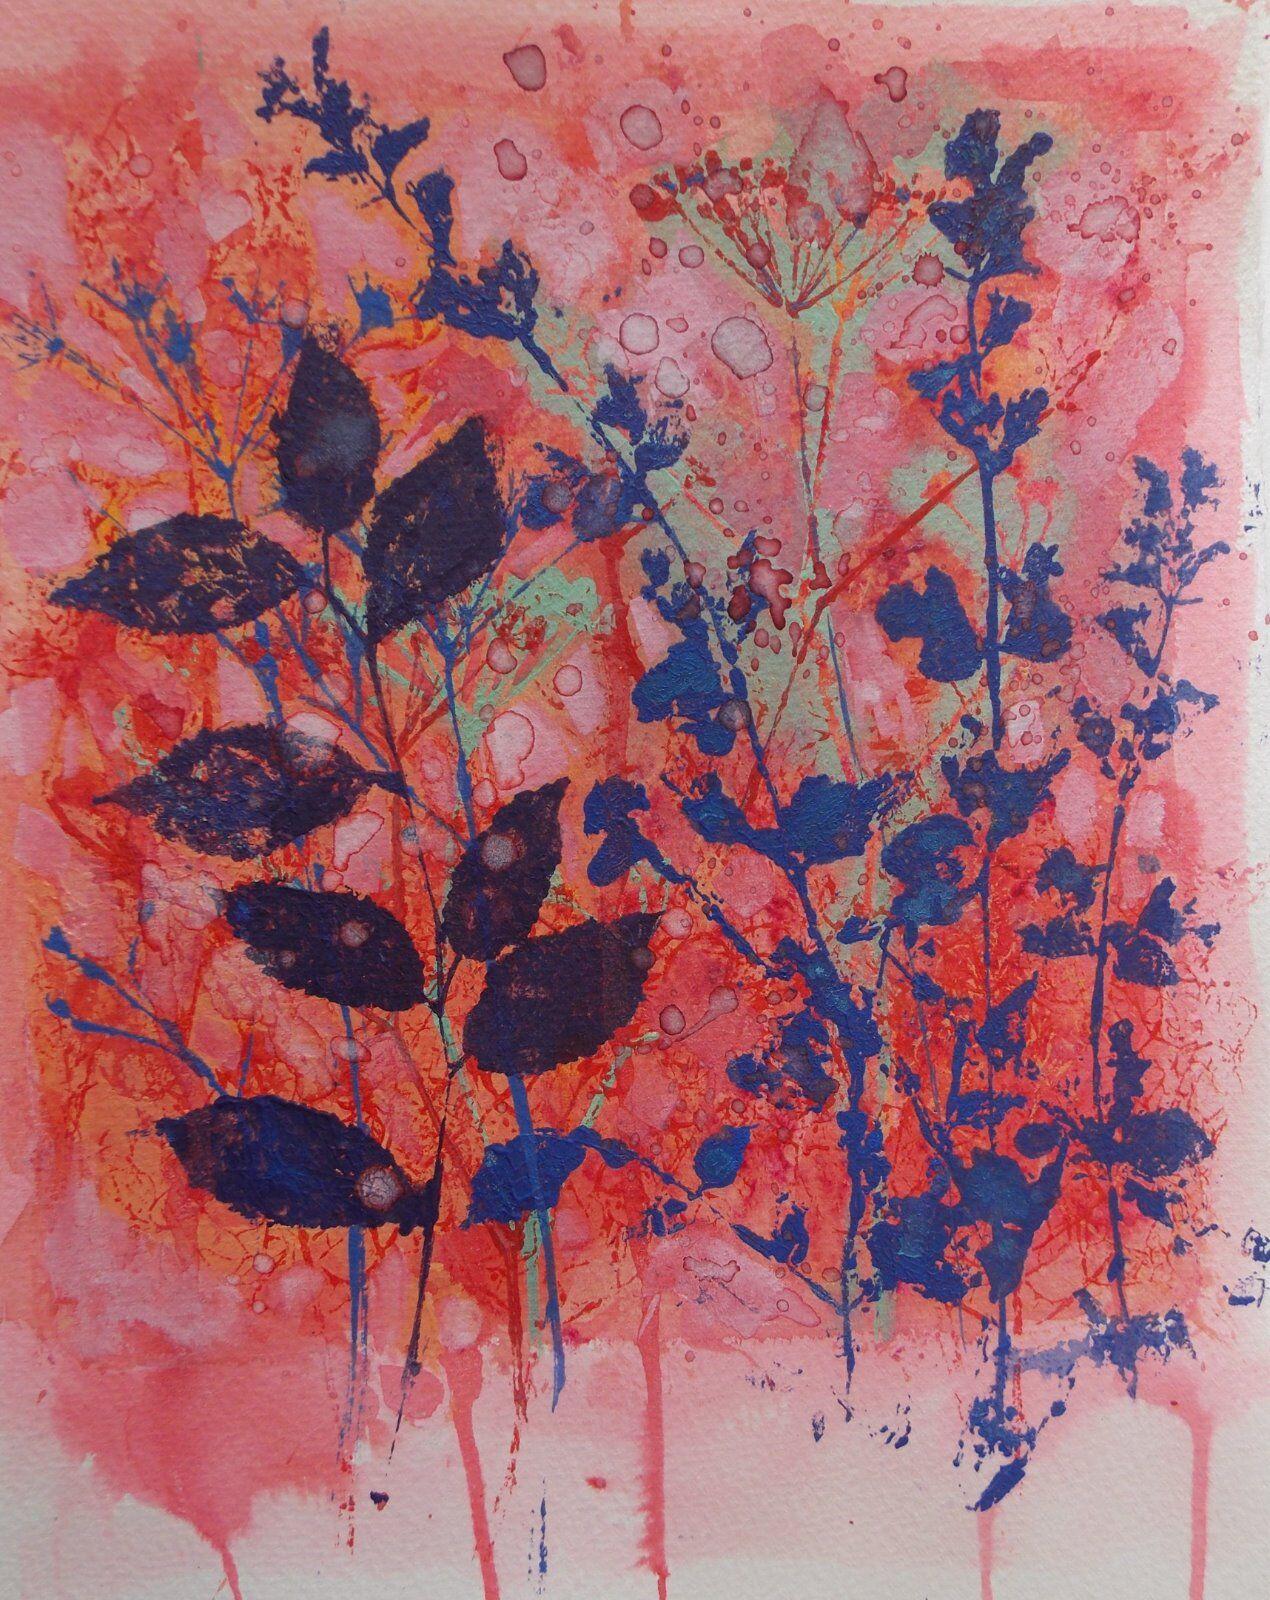 Blue Catnip and Elder Leaves